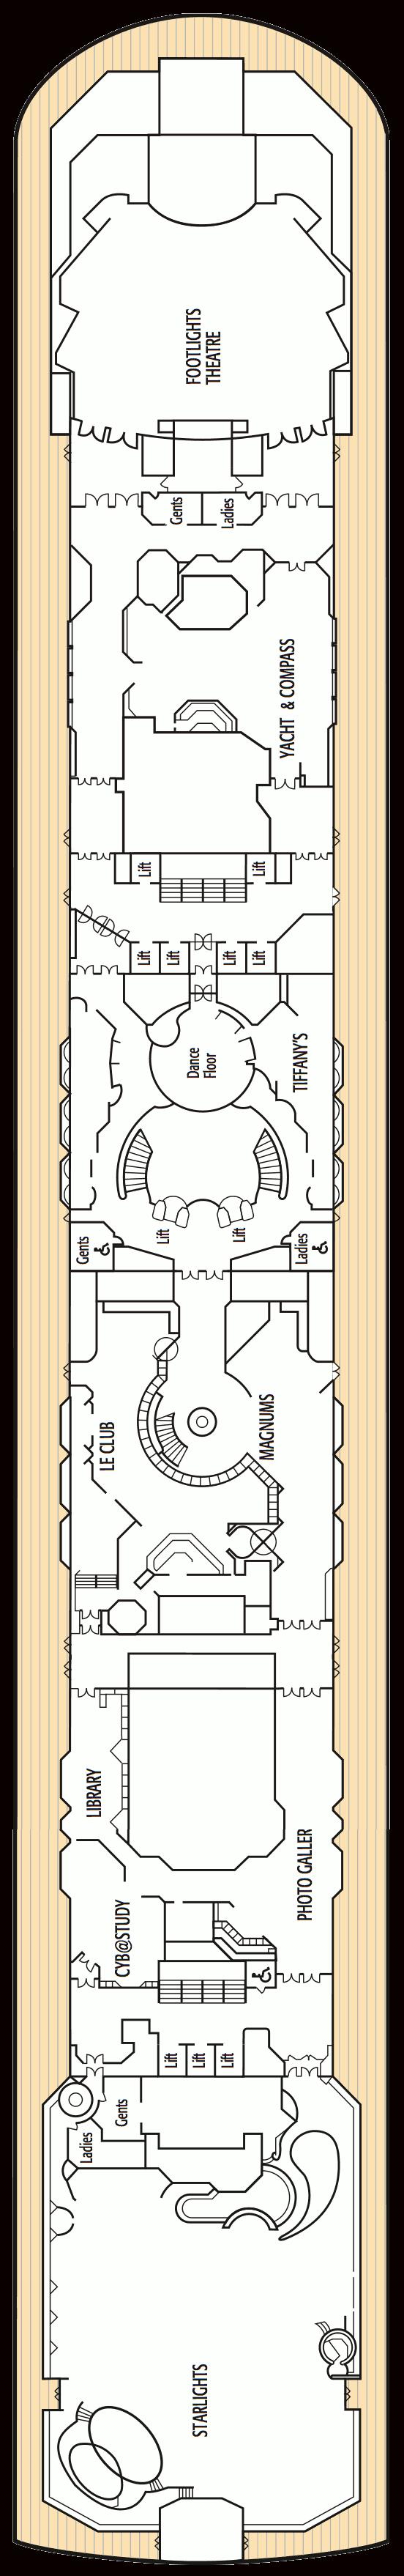 Oceana deck plans deck 7 baanklon Choice Image